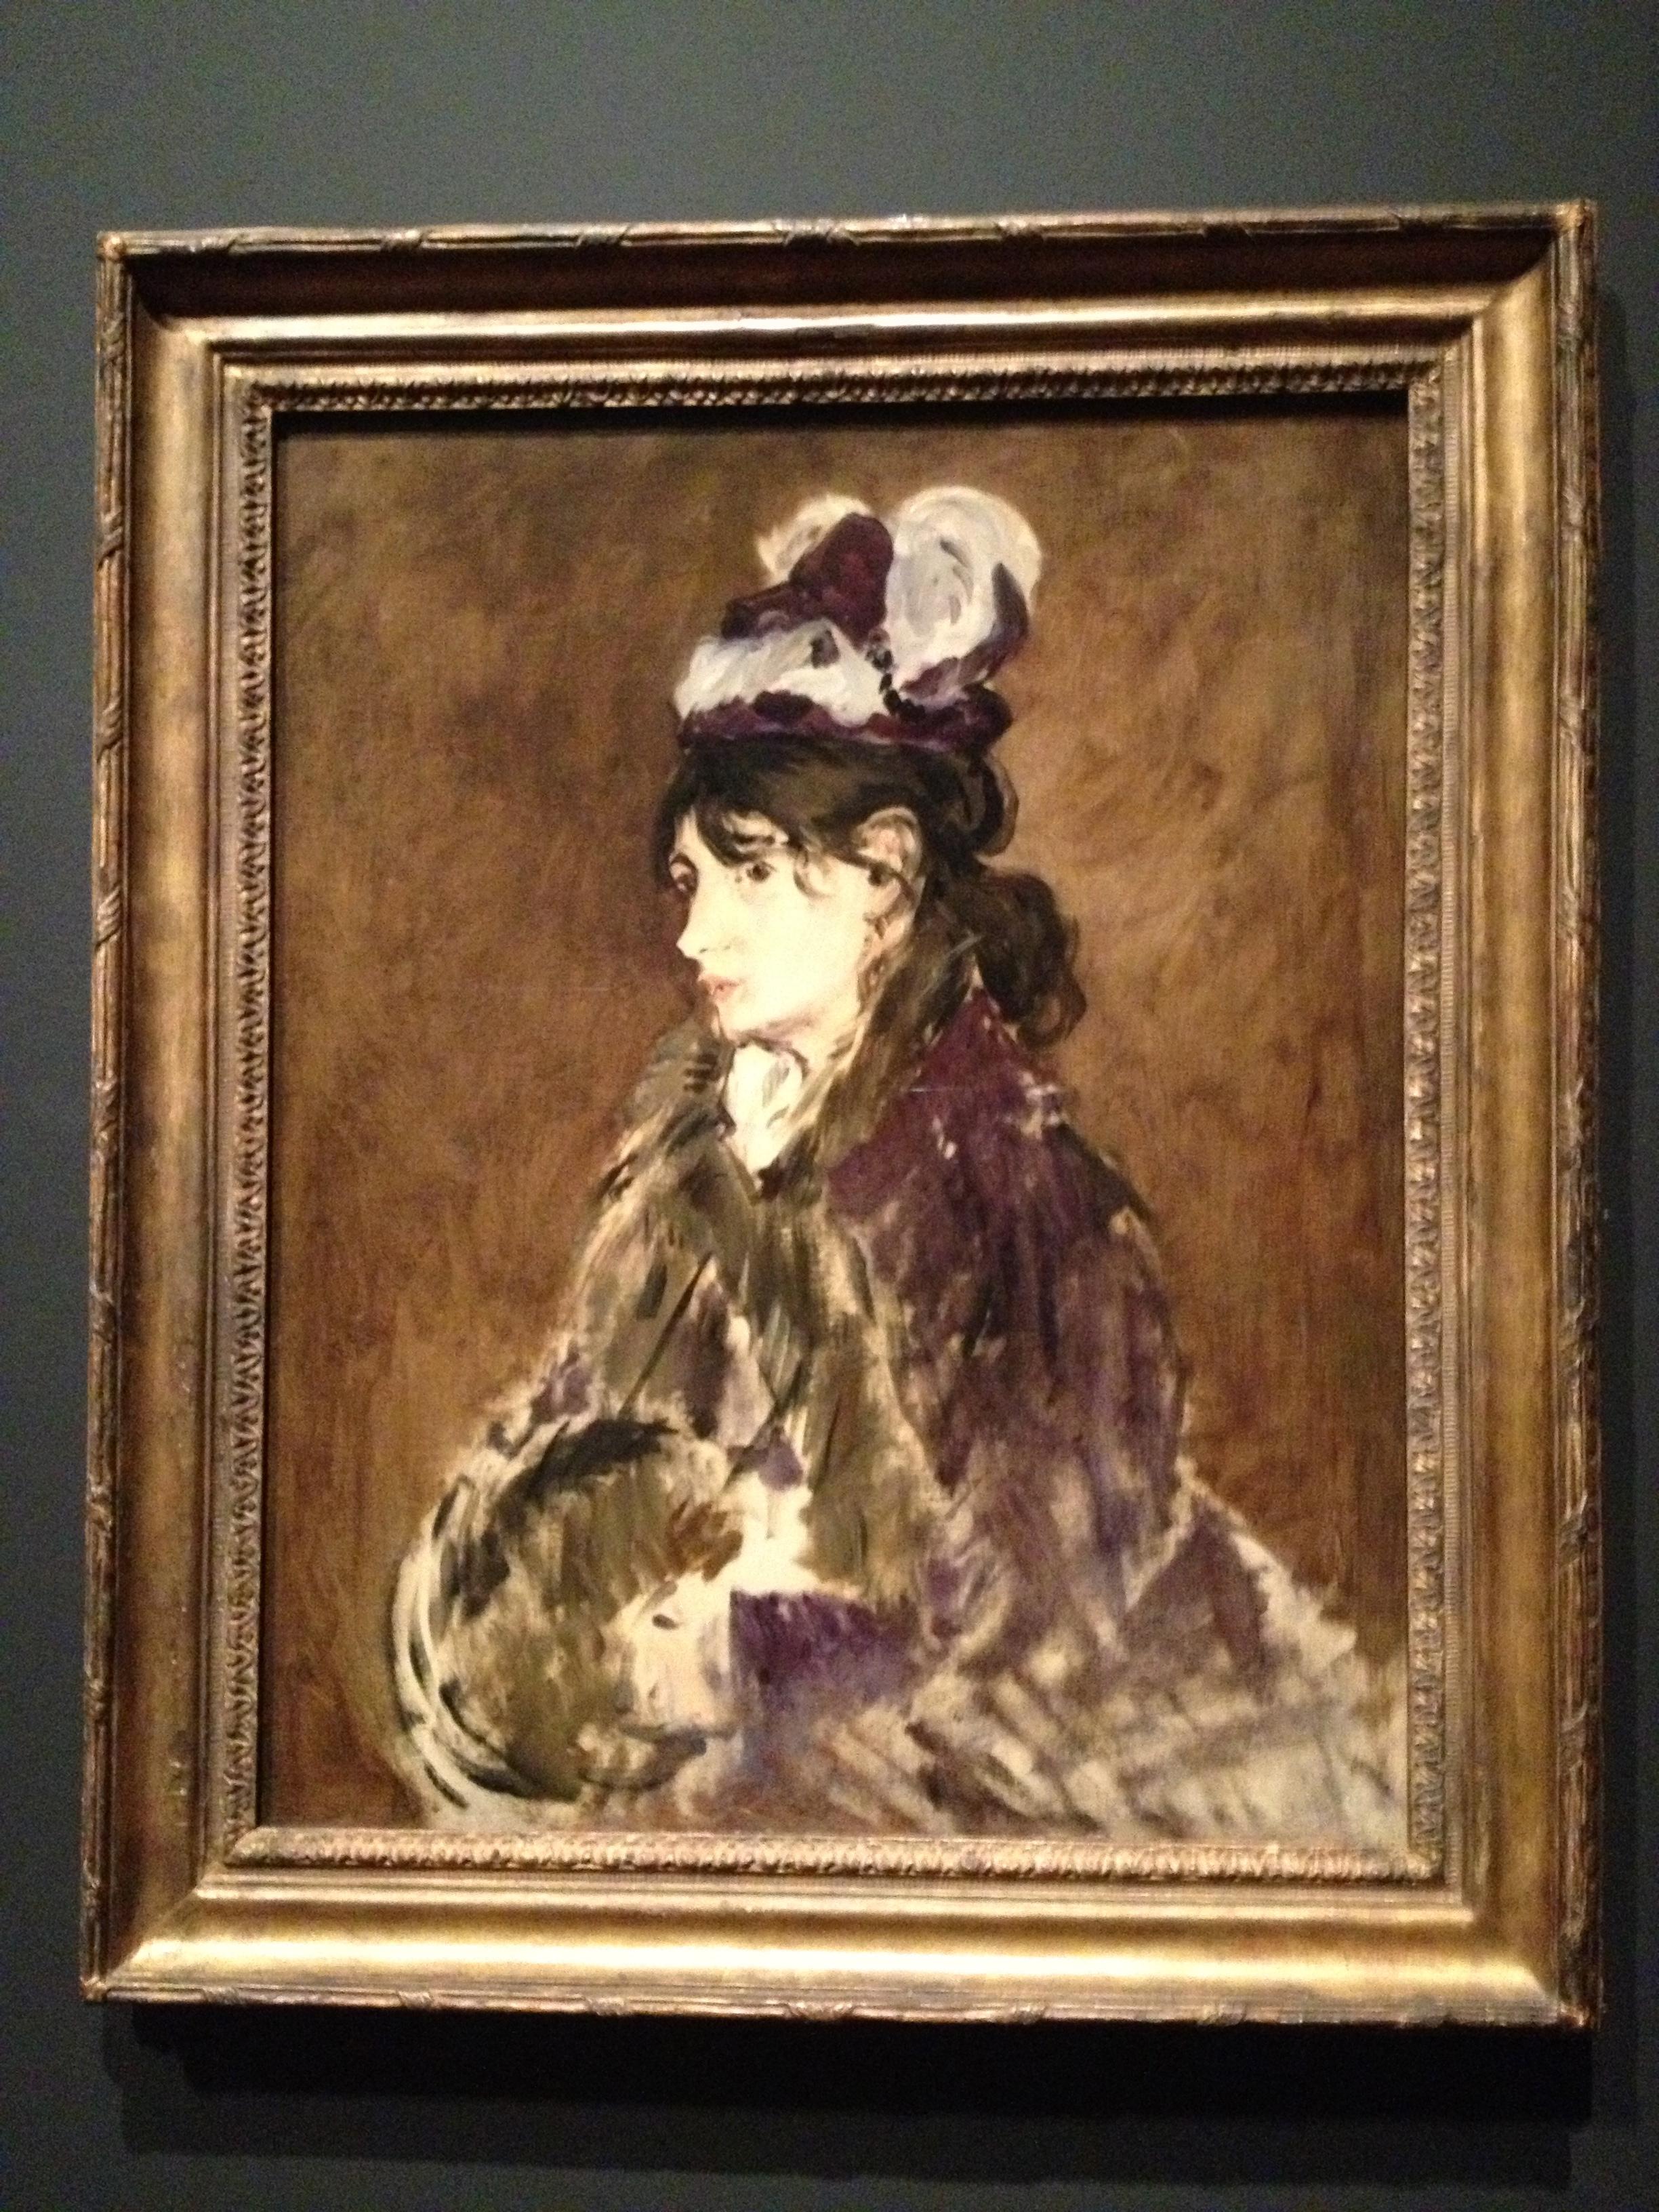 Berthe Morisot, 1868-69, 1870-71, Oil on fabric. Cleveland Museum of Art